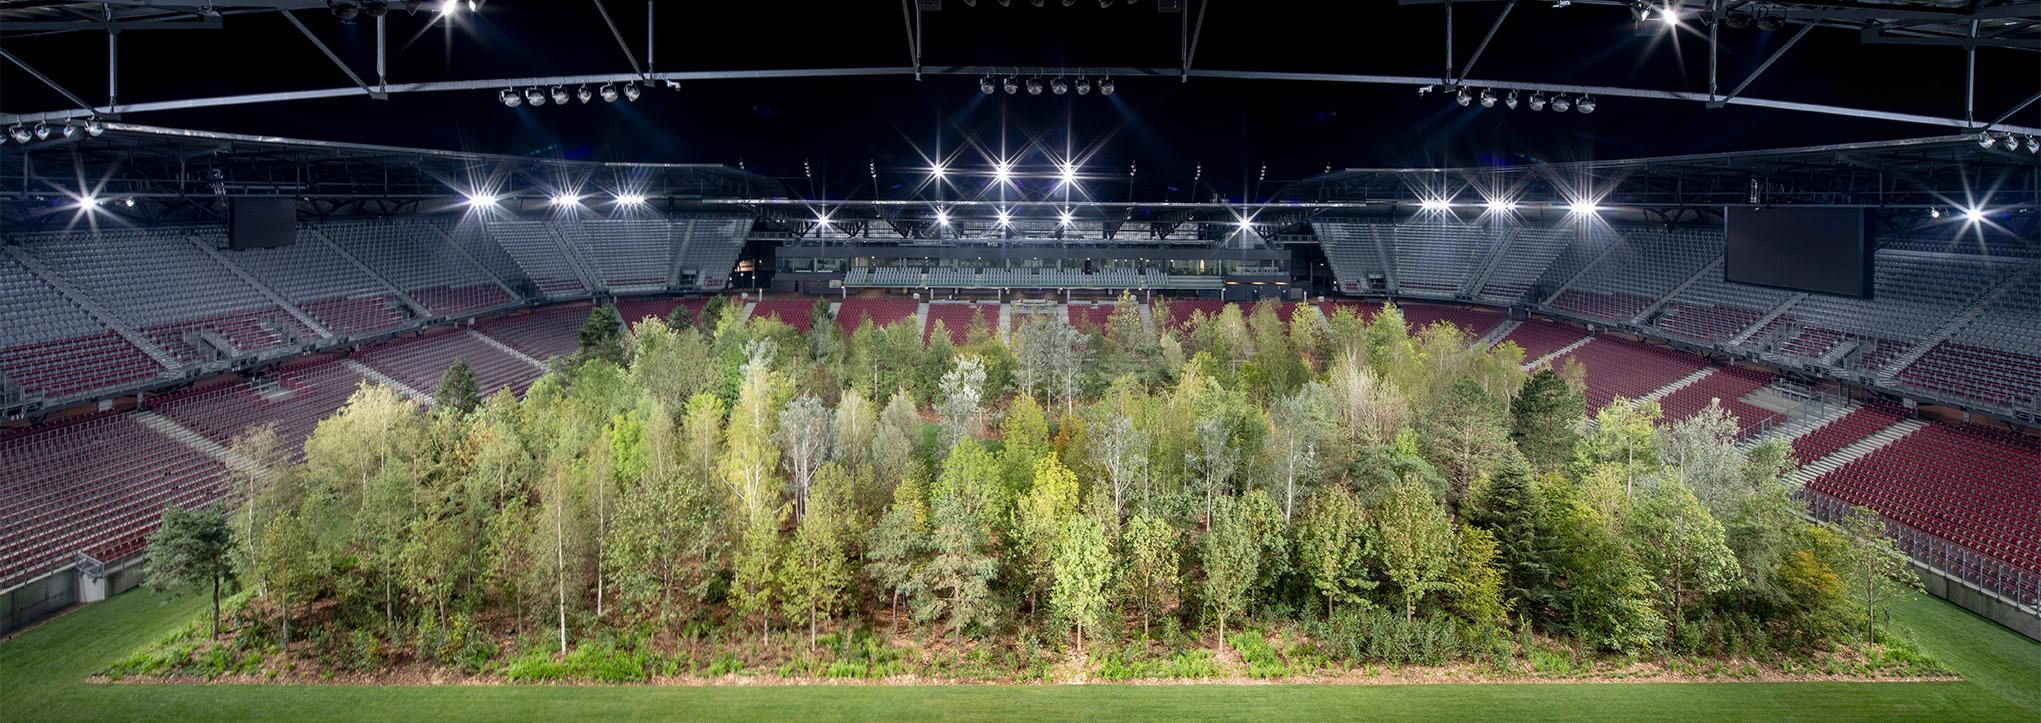 Visual of 299 trees grow in a football stadium